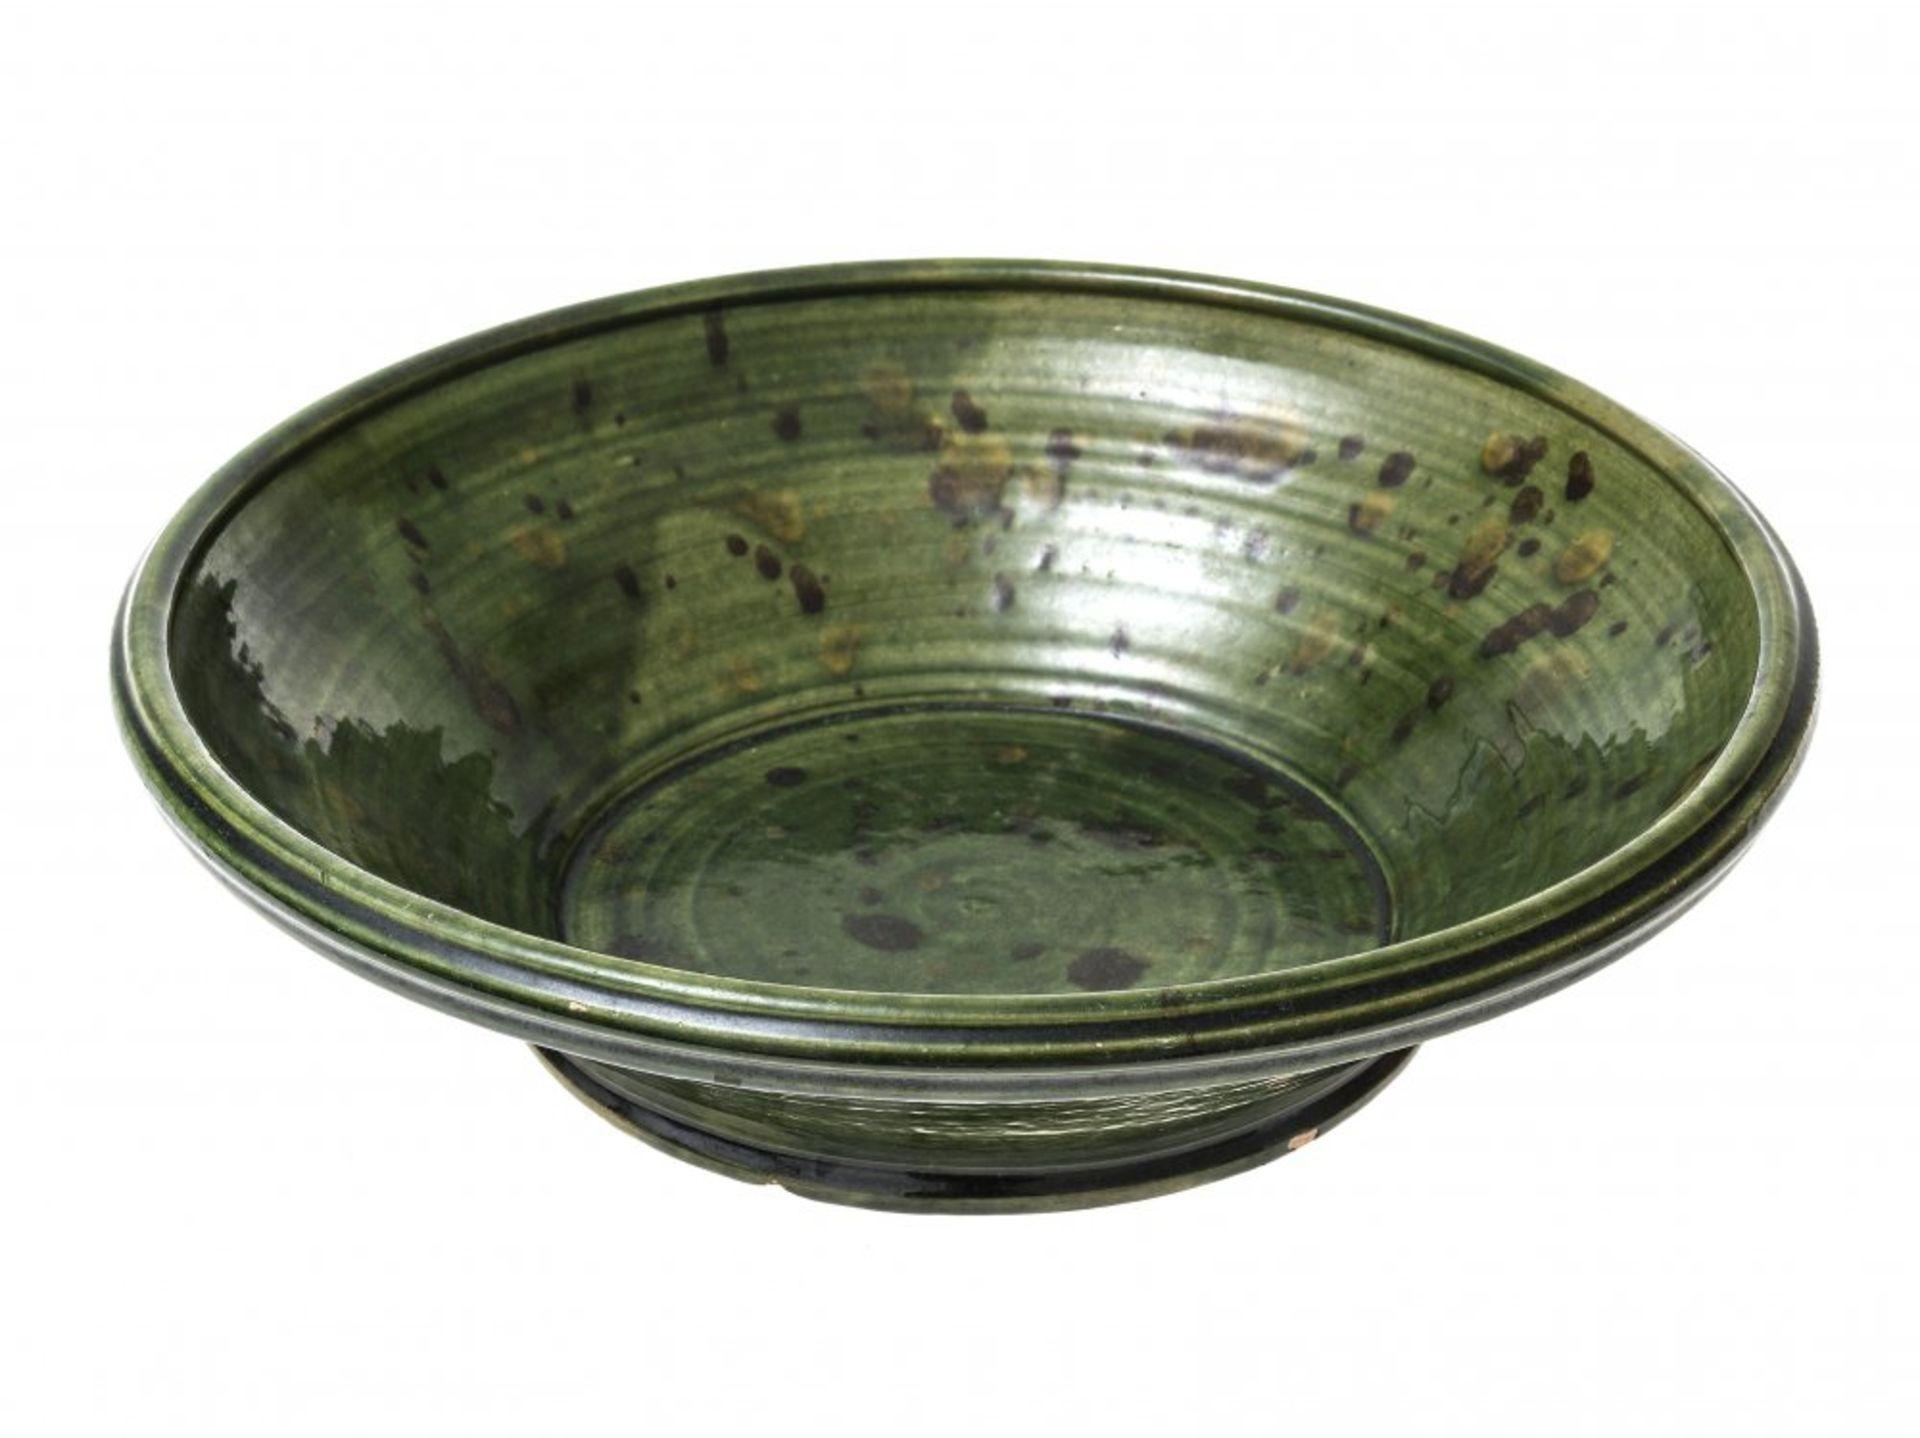 Los 30 - Manz, Jörg vonSchüssel, Keramik. Grün glasiert. ø 33 cm. Unsign.